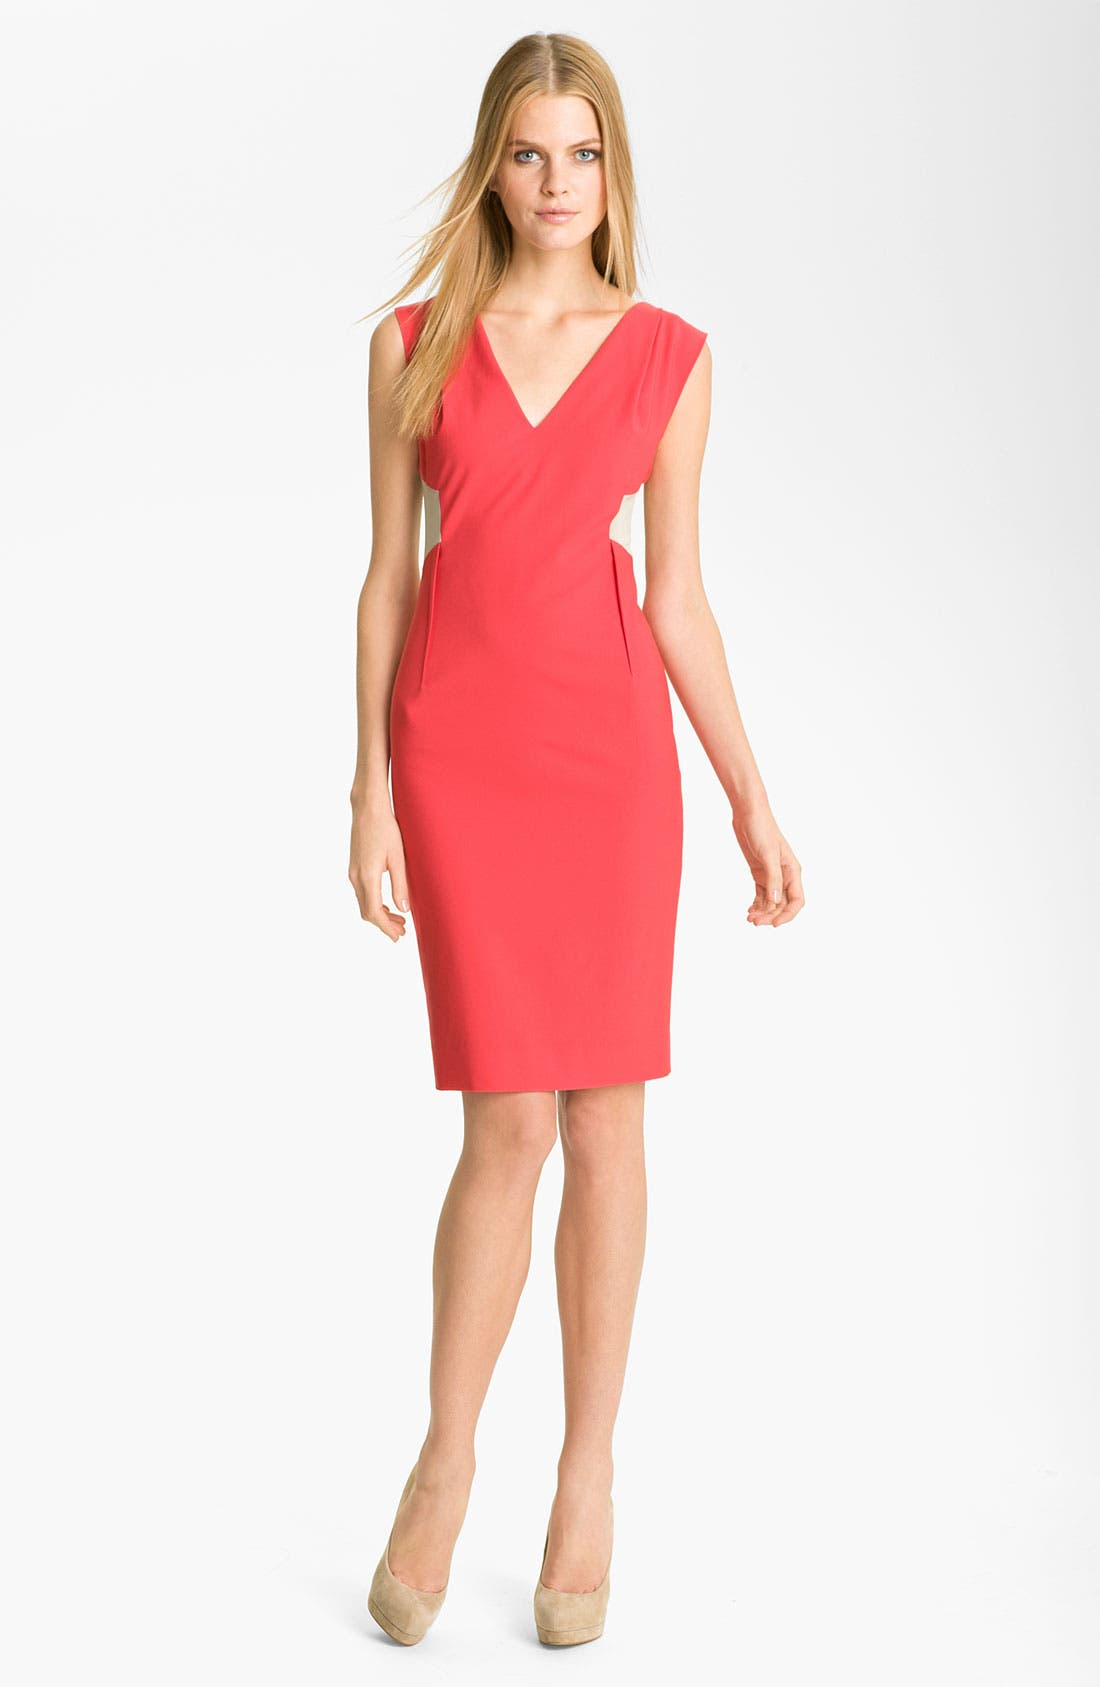 Alternate Image 1 Selected - Rachel Roy Colorblock Tropical Wool Sheath Dress